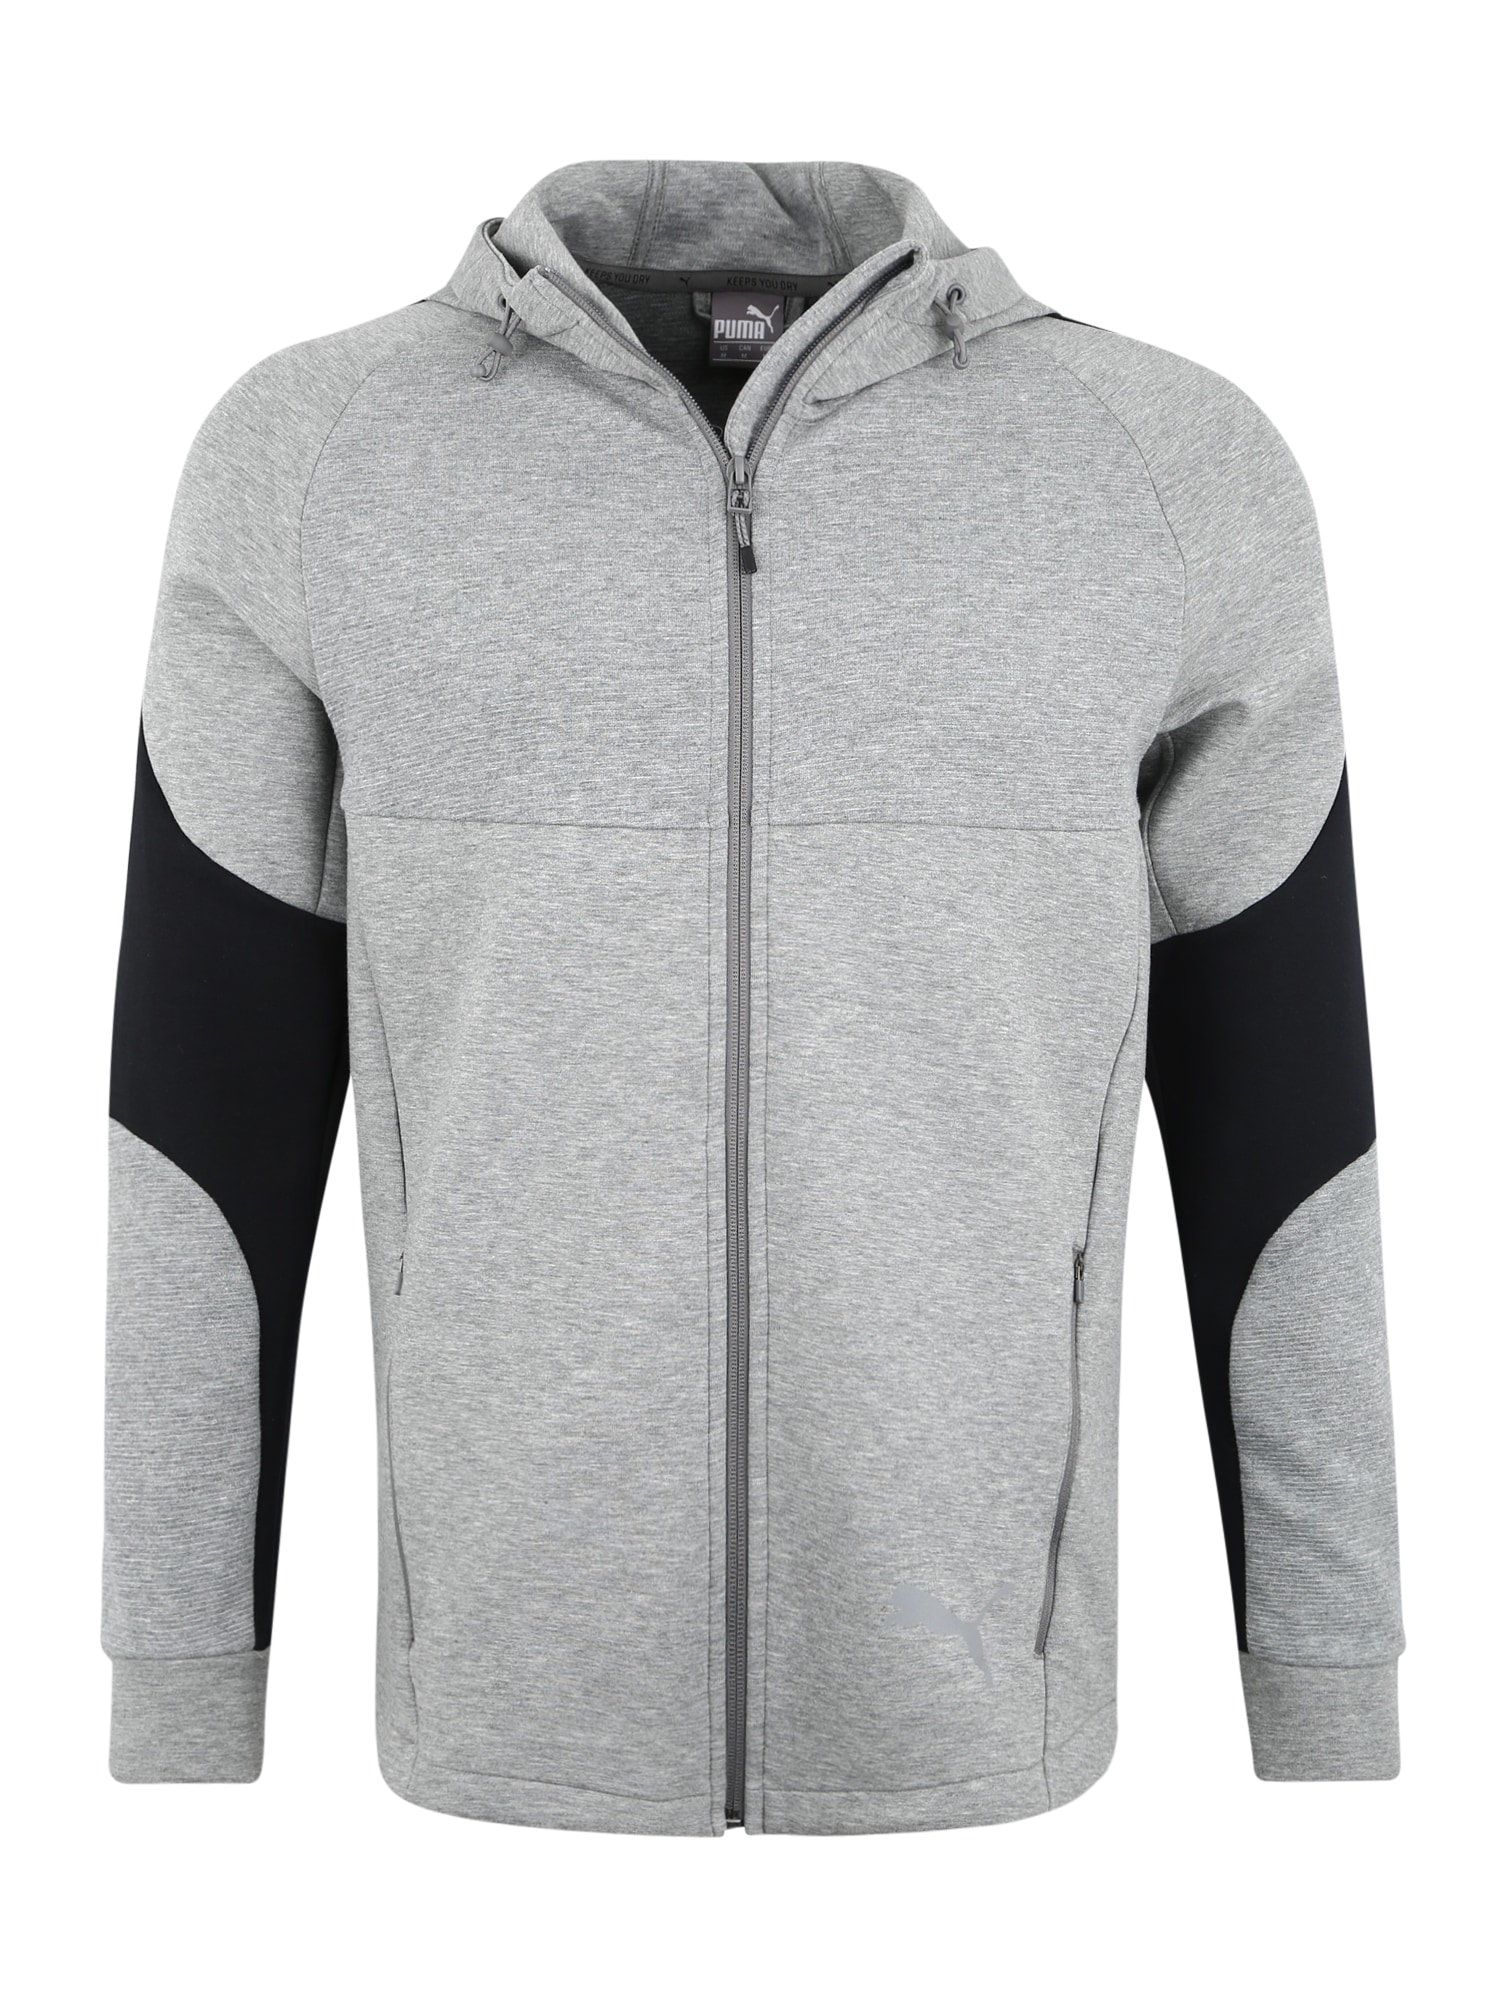 Sportsweatshirt 'Evostripe FZ' | Sportbekleidung > Sportshirts | Grau - Schwarz | Puma